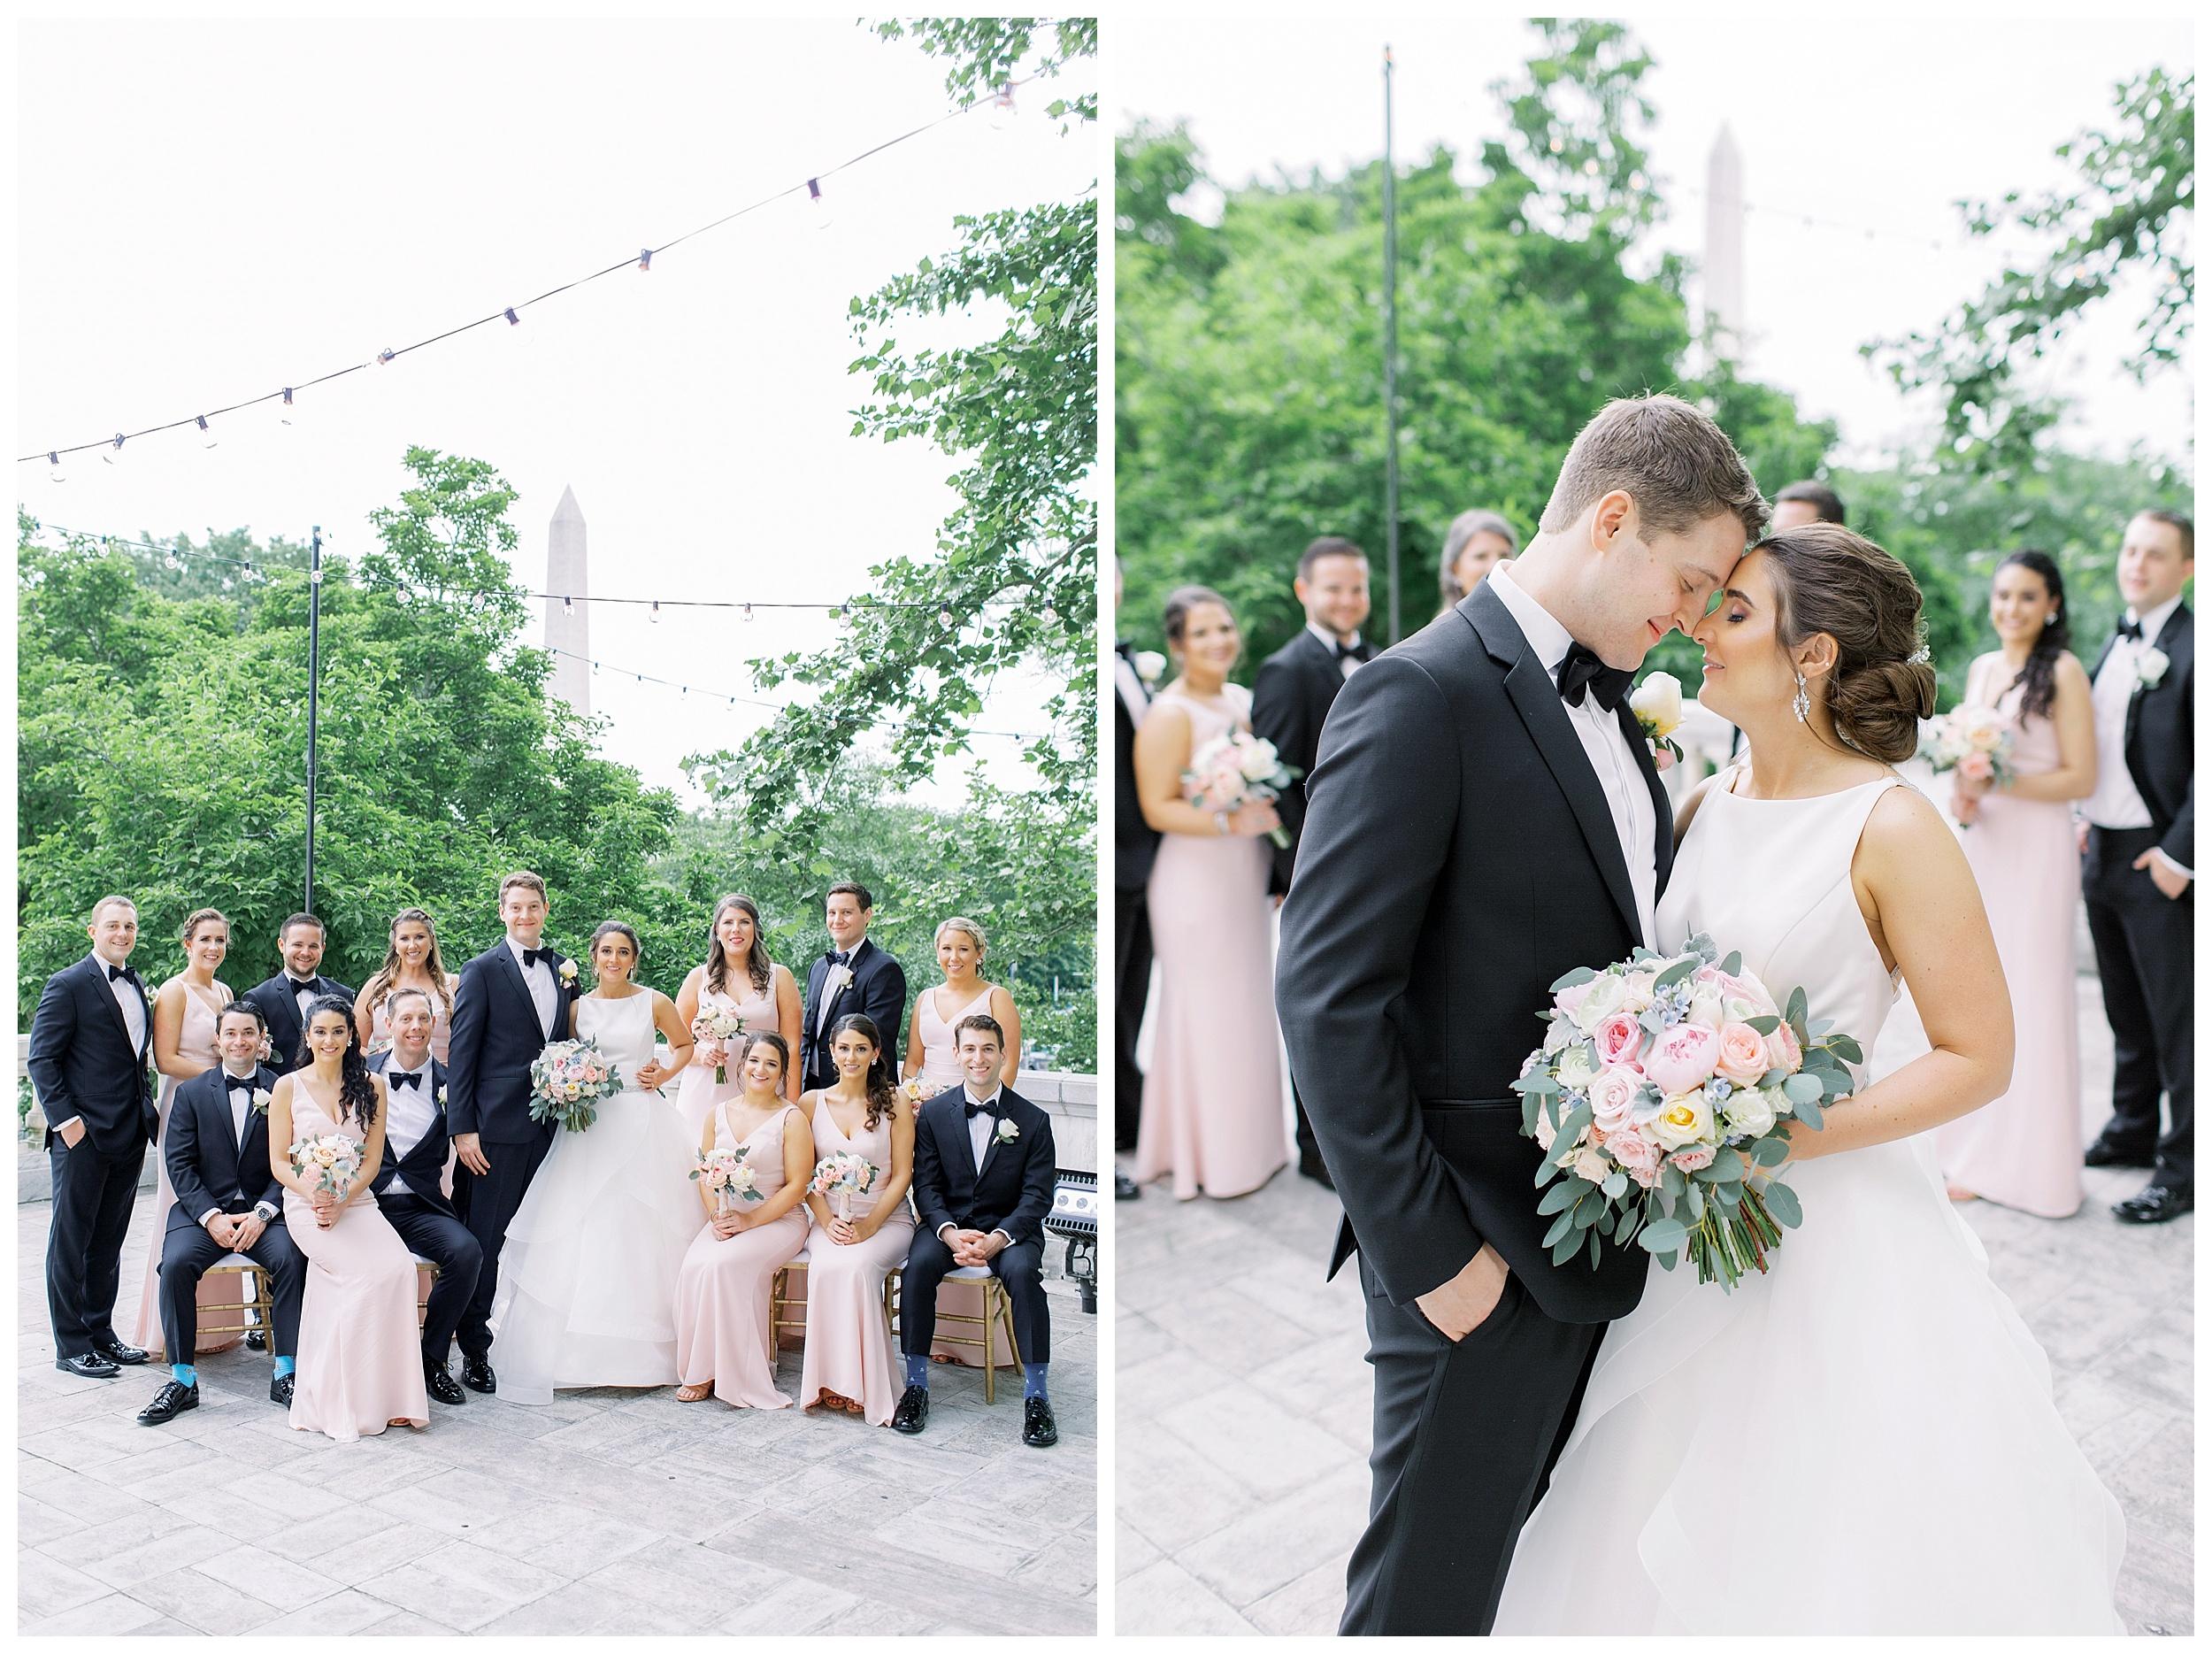 DAR Constitution Hall Wedding Wedding | Daughters of the American Revolution Wedding | District of Columbia Film Wedding Photographer Kir Tuben_0073.jpg